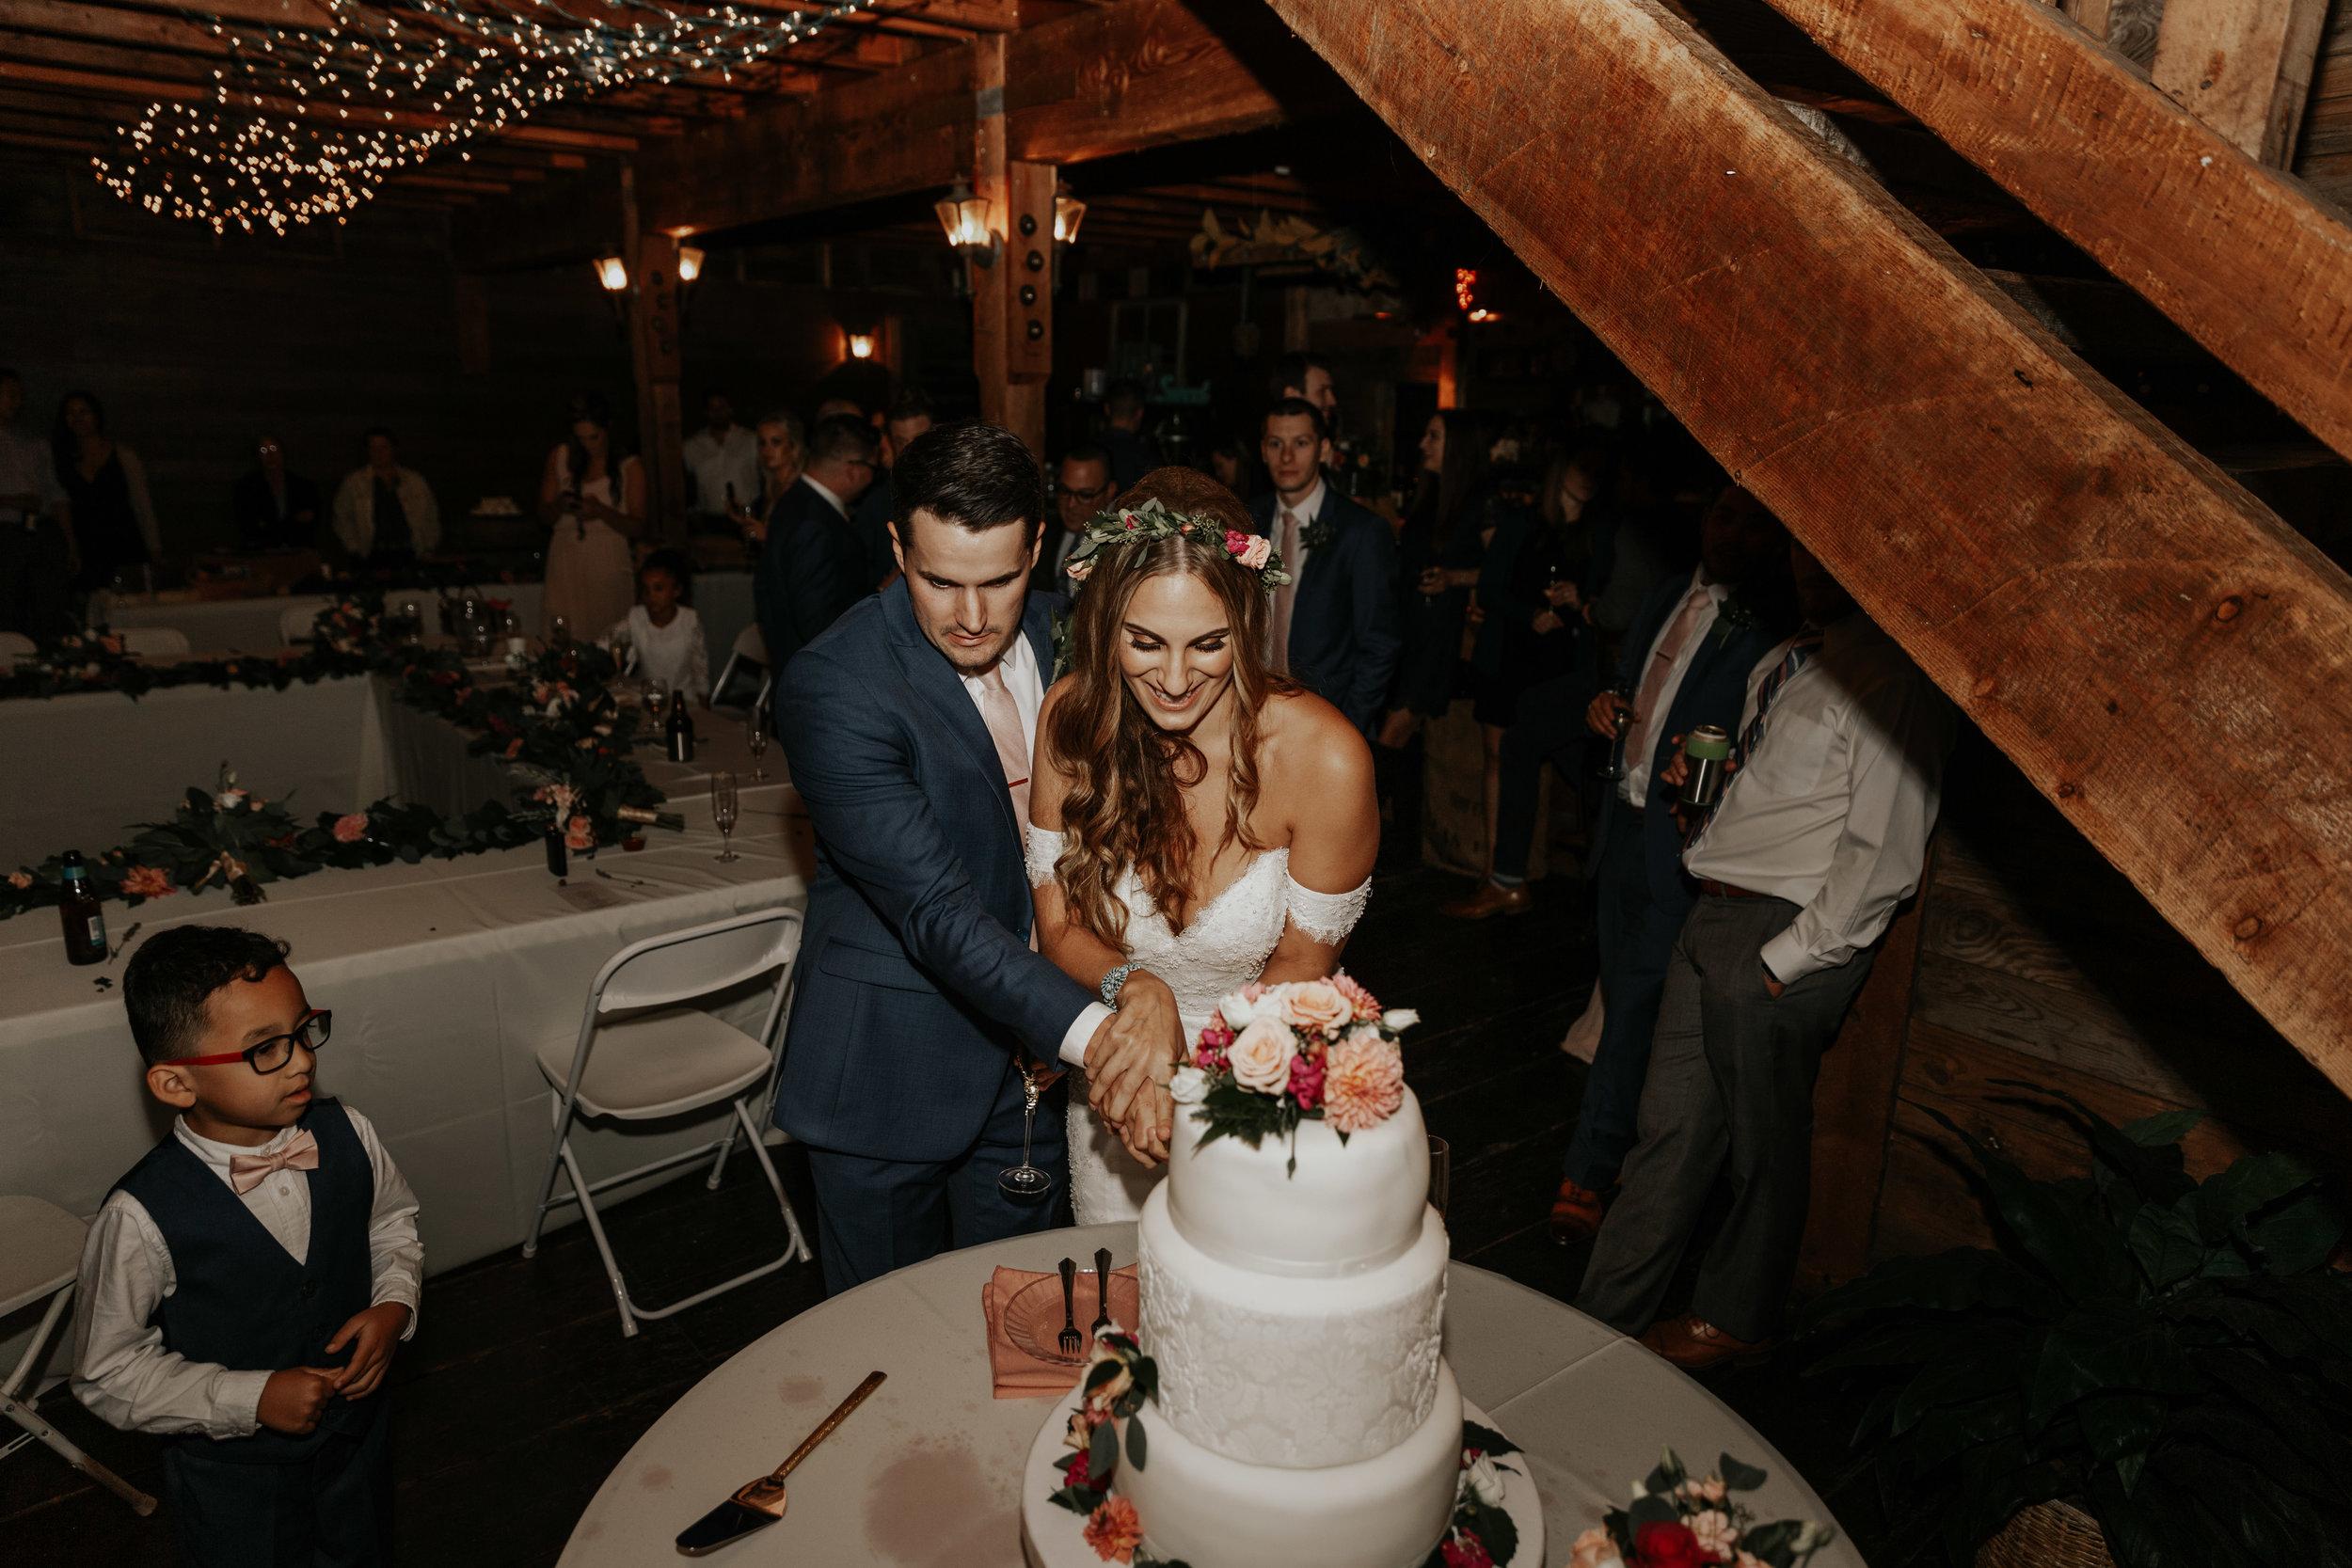 ginapaulson_jakitrevor_wedding-963.jpg